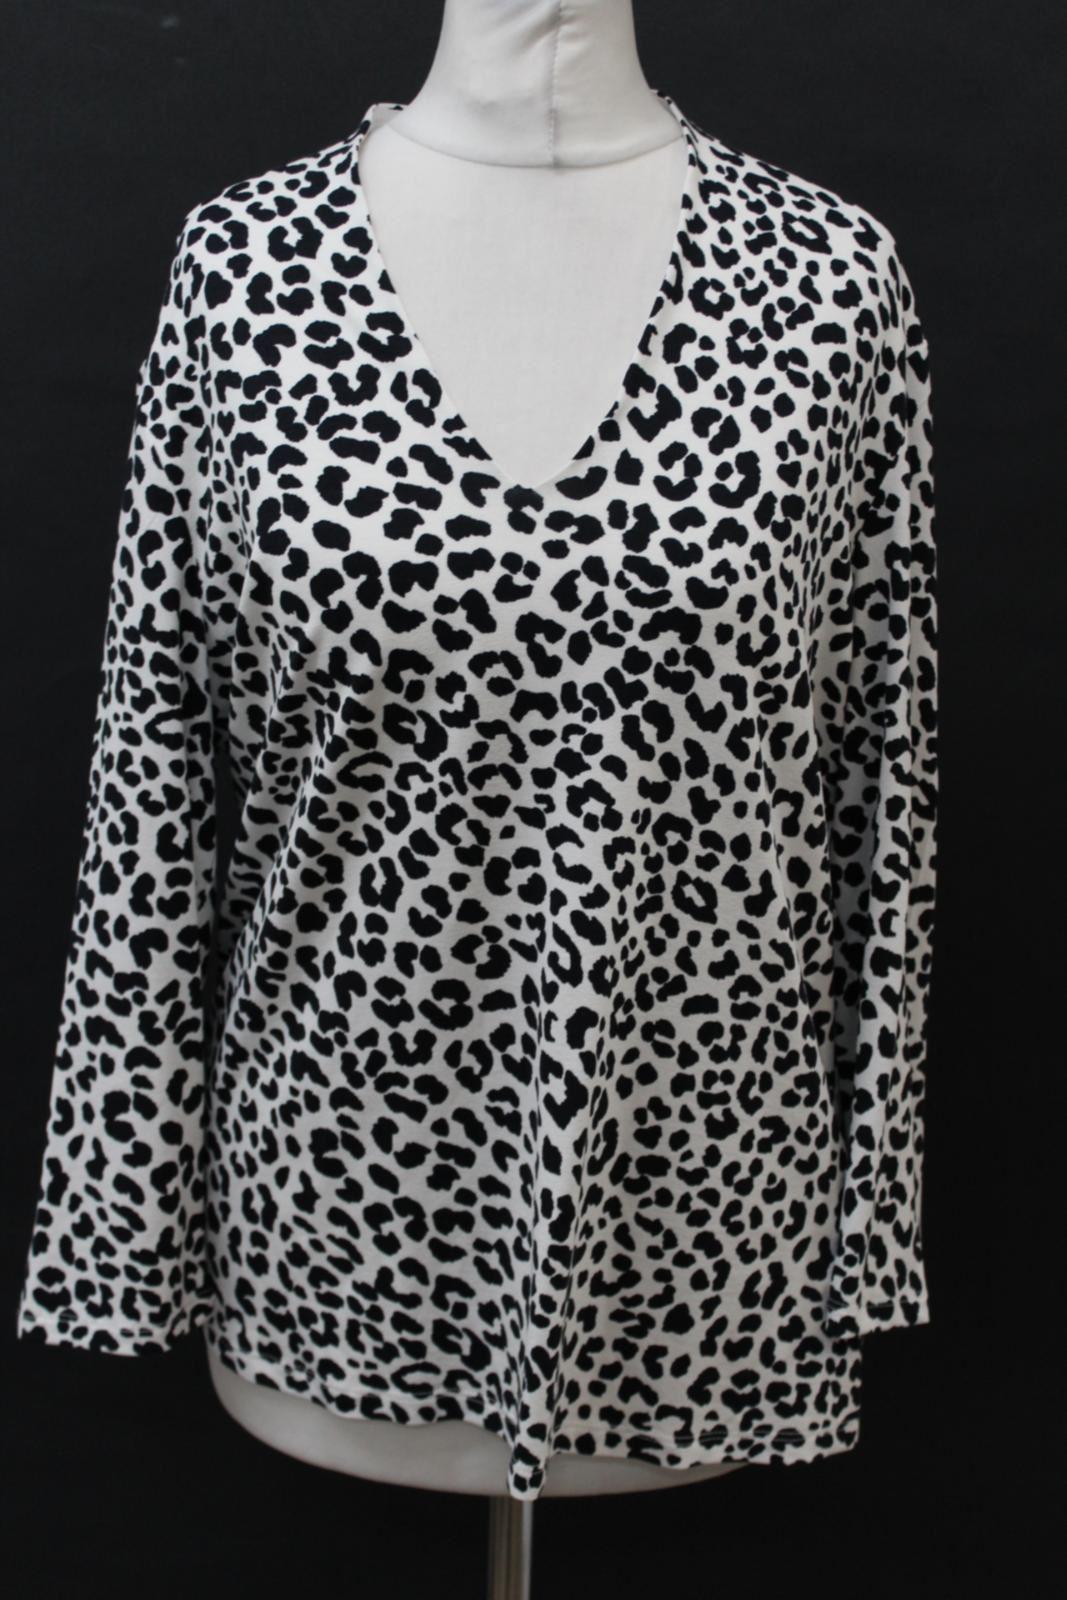 HOBBS-Ladies-Aimee-Navy-Ivory-Spotted-Print-3-4-Sleeve-Top-Size-Large-NEW